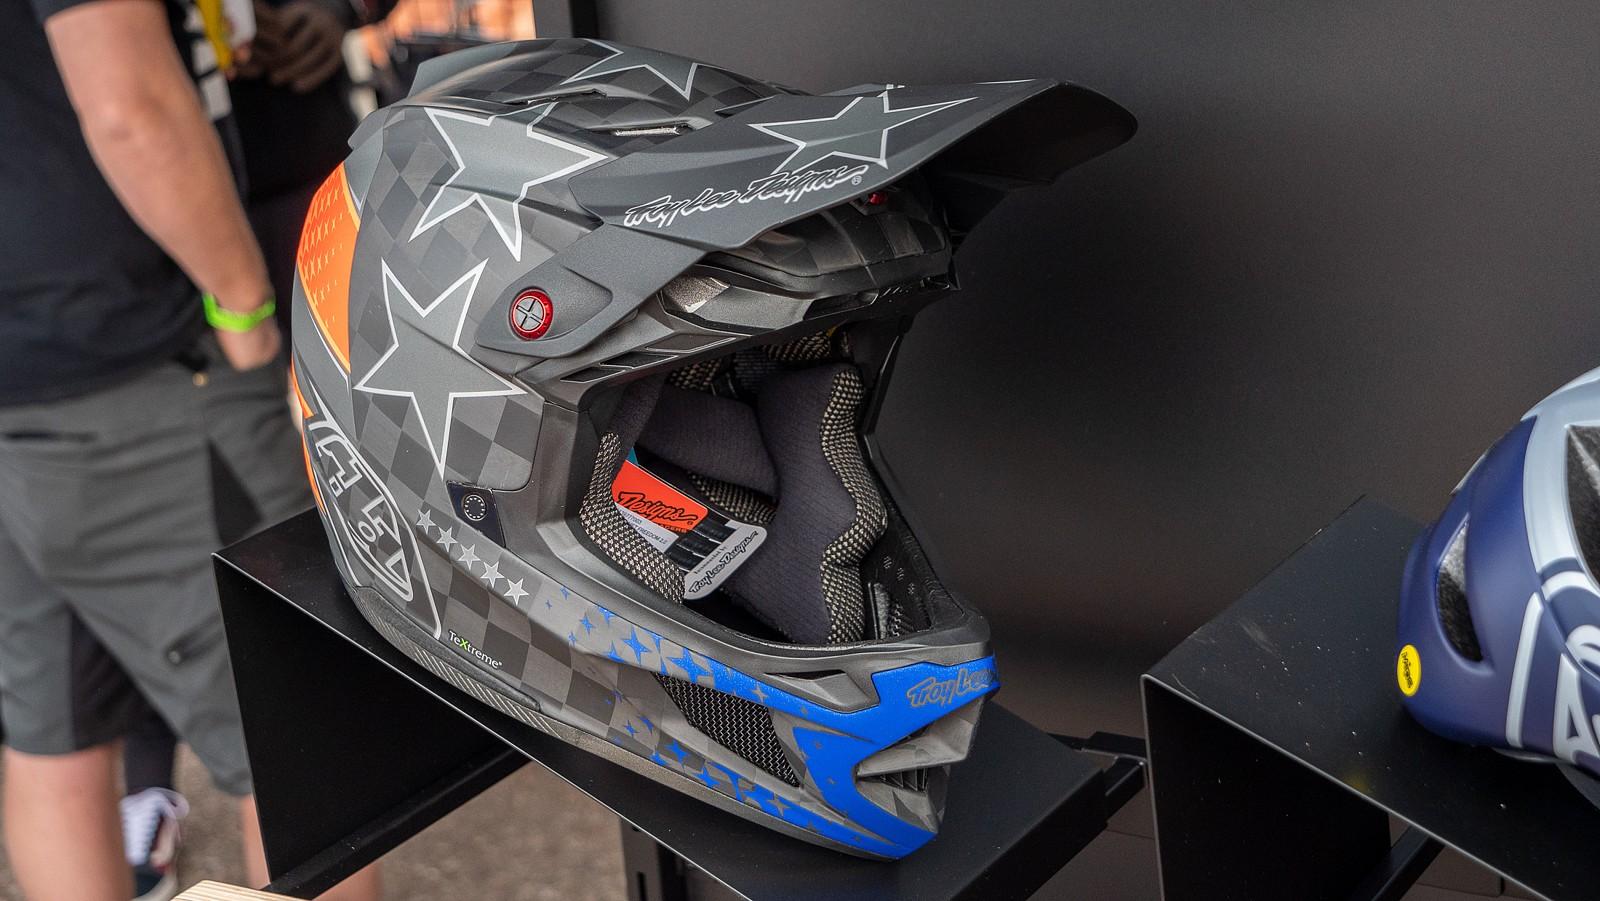 Troy Lee Designs D4 Helmet - PIT BITS 2 - Sedona Bike Festival 2020 - Mountain Biking Pictures - Vital MTB